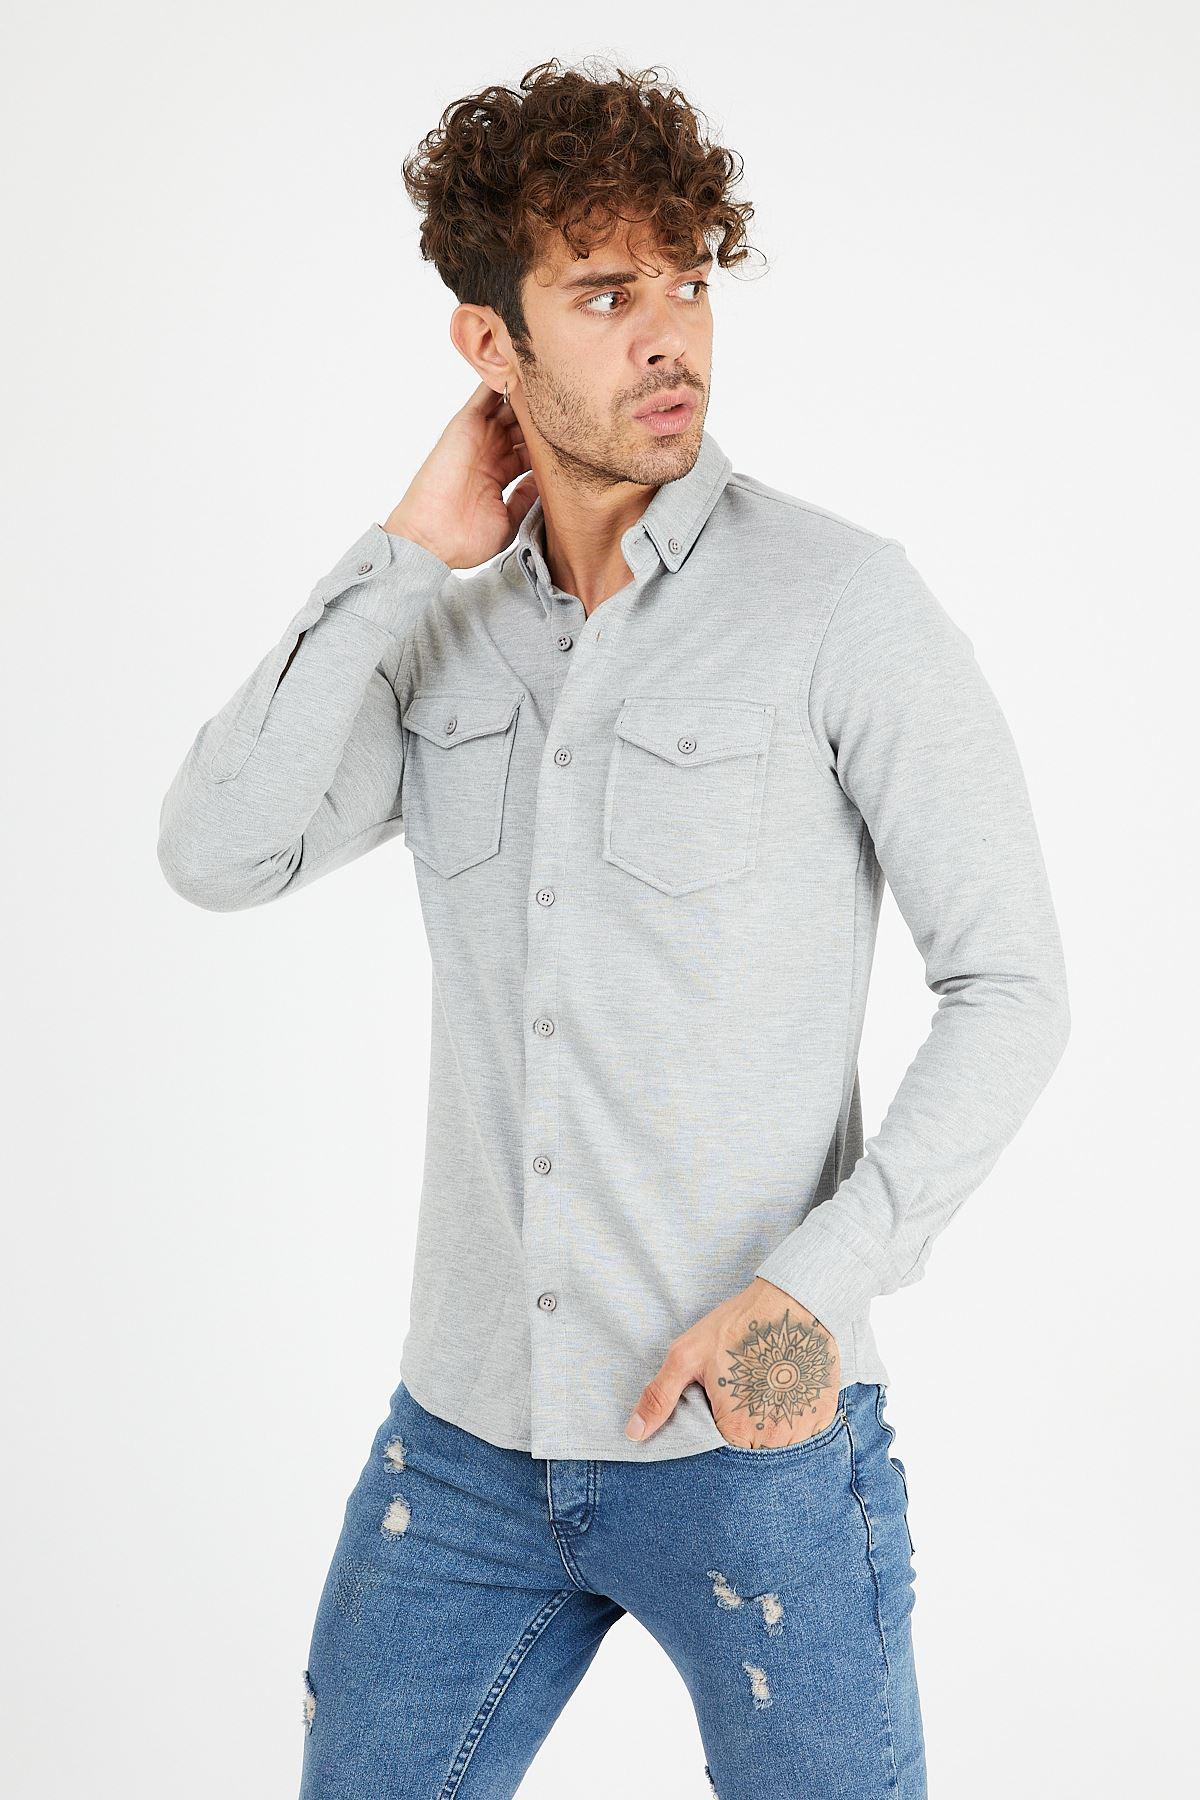 Çift Cep Gömlek